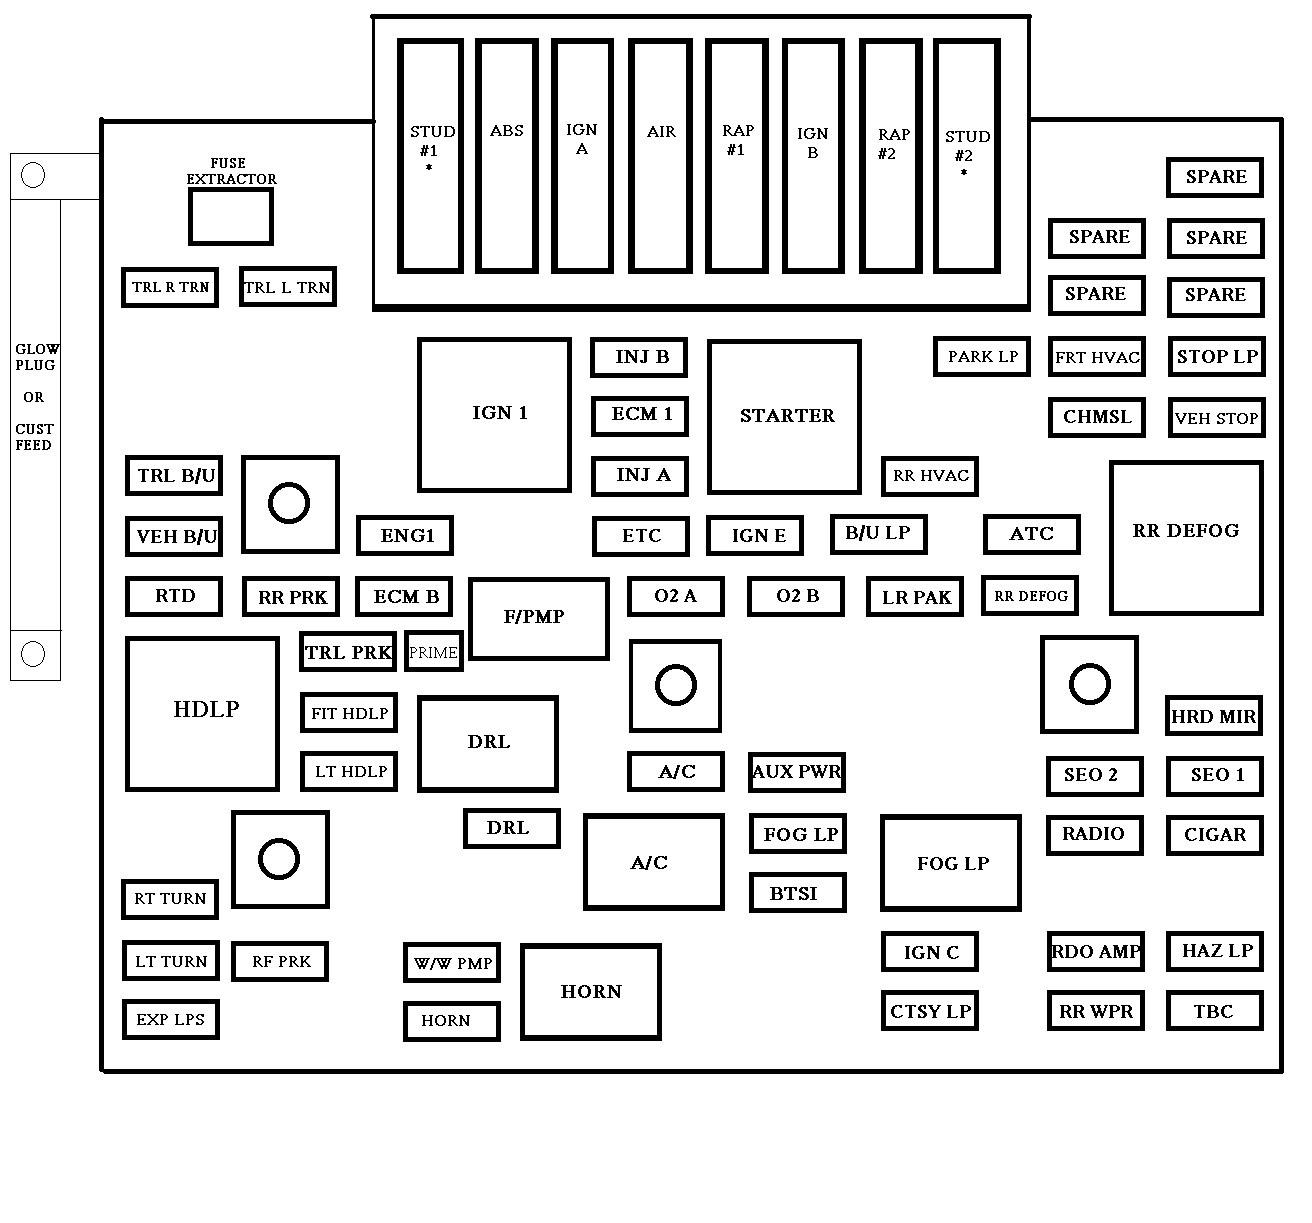 2007 Chevy Hhr Fuse Diagram Led Light Wiring Schematic Cts Lsa 2020ok Jiwa Jeanjaures37 Fr